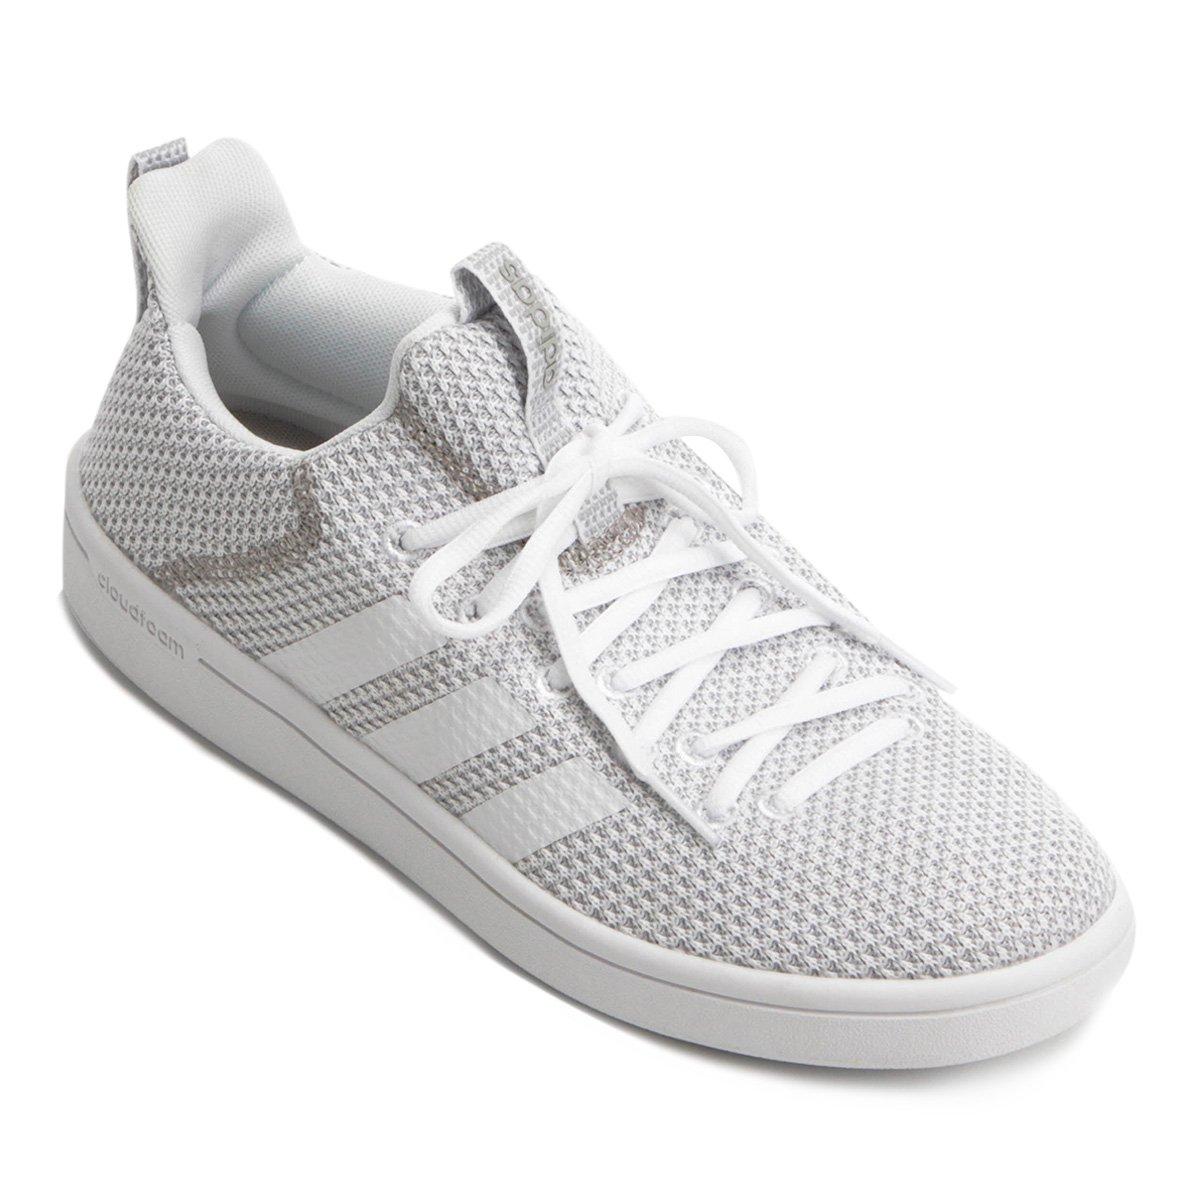 613f5468a96 Tênis Adidas Cloudfoam Advantage Adapt Masculino - Branco e Cinza - Compre  Agora